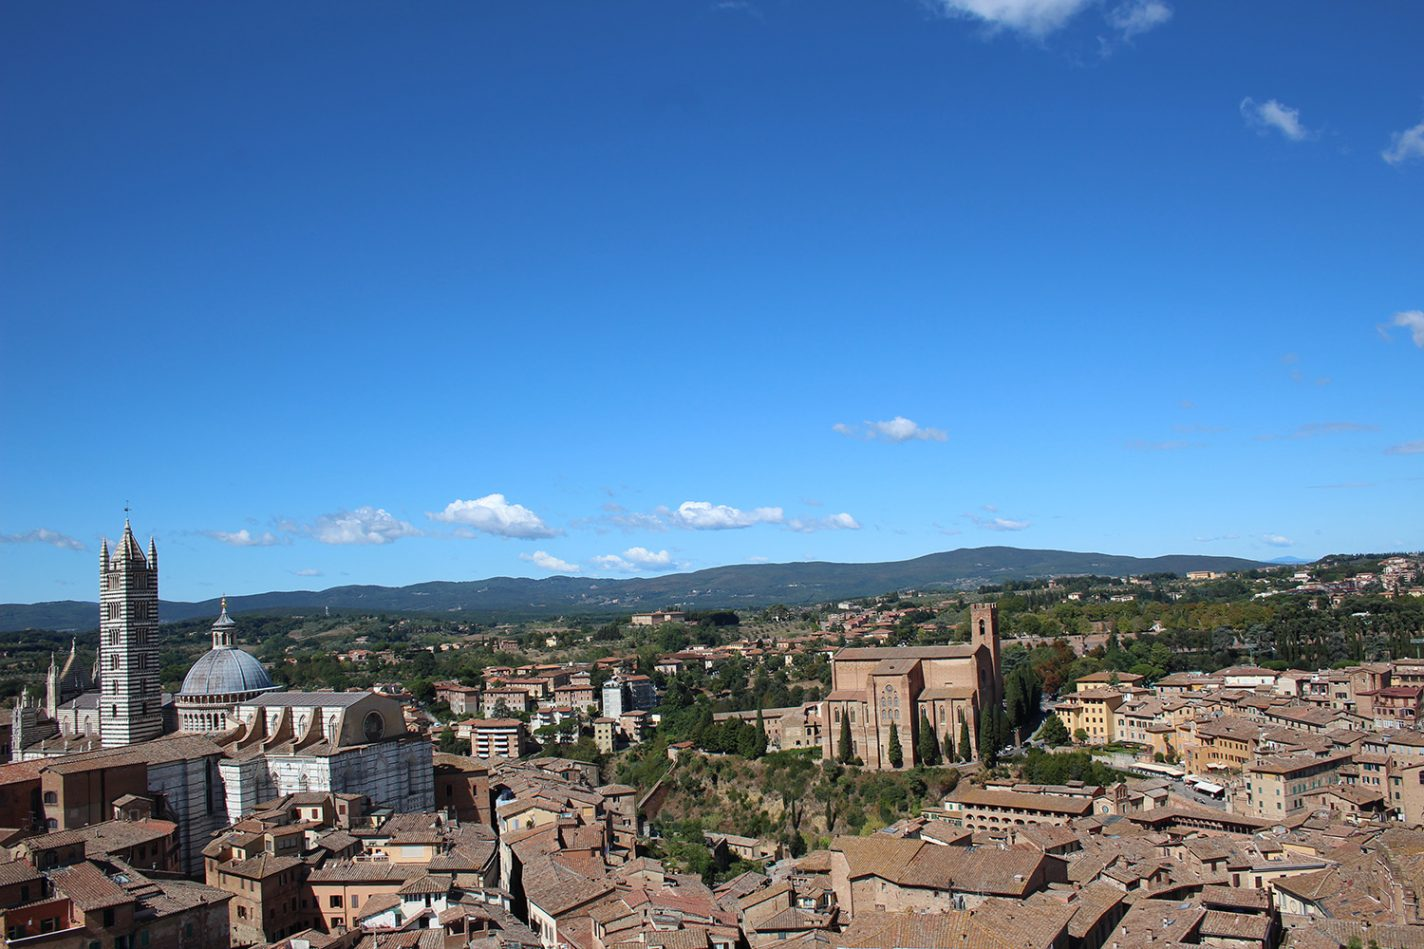 Uitzicht over Siena vanaf Torre del Mangia - mooiste Europese stad